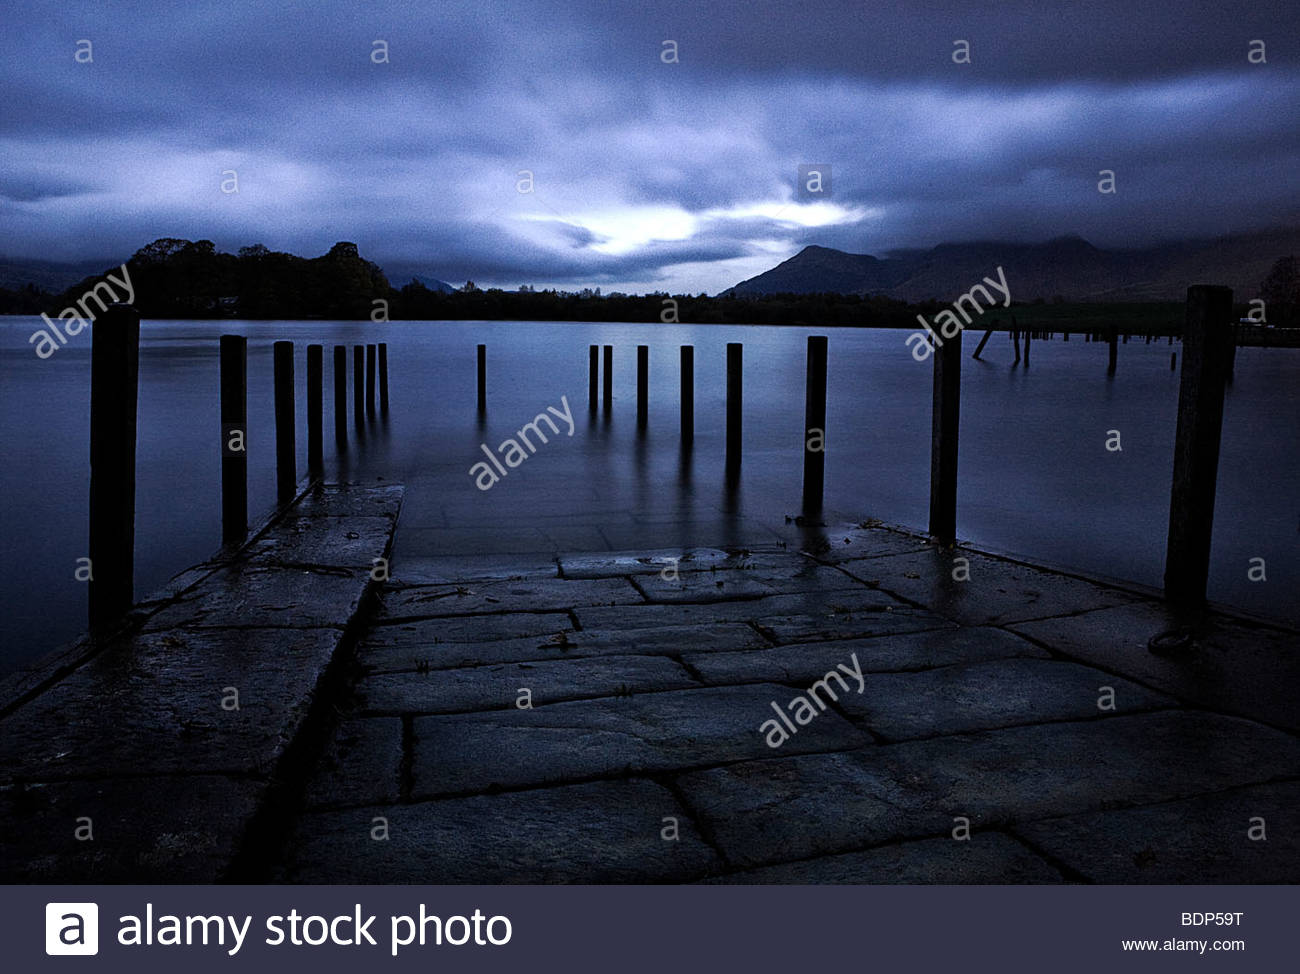 A nightime view across a lake - Stock Image